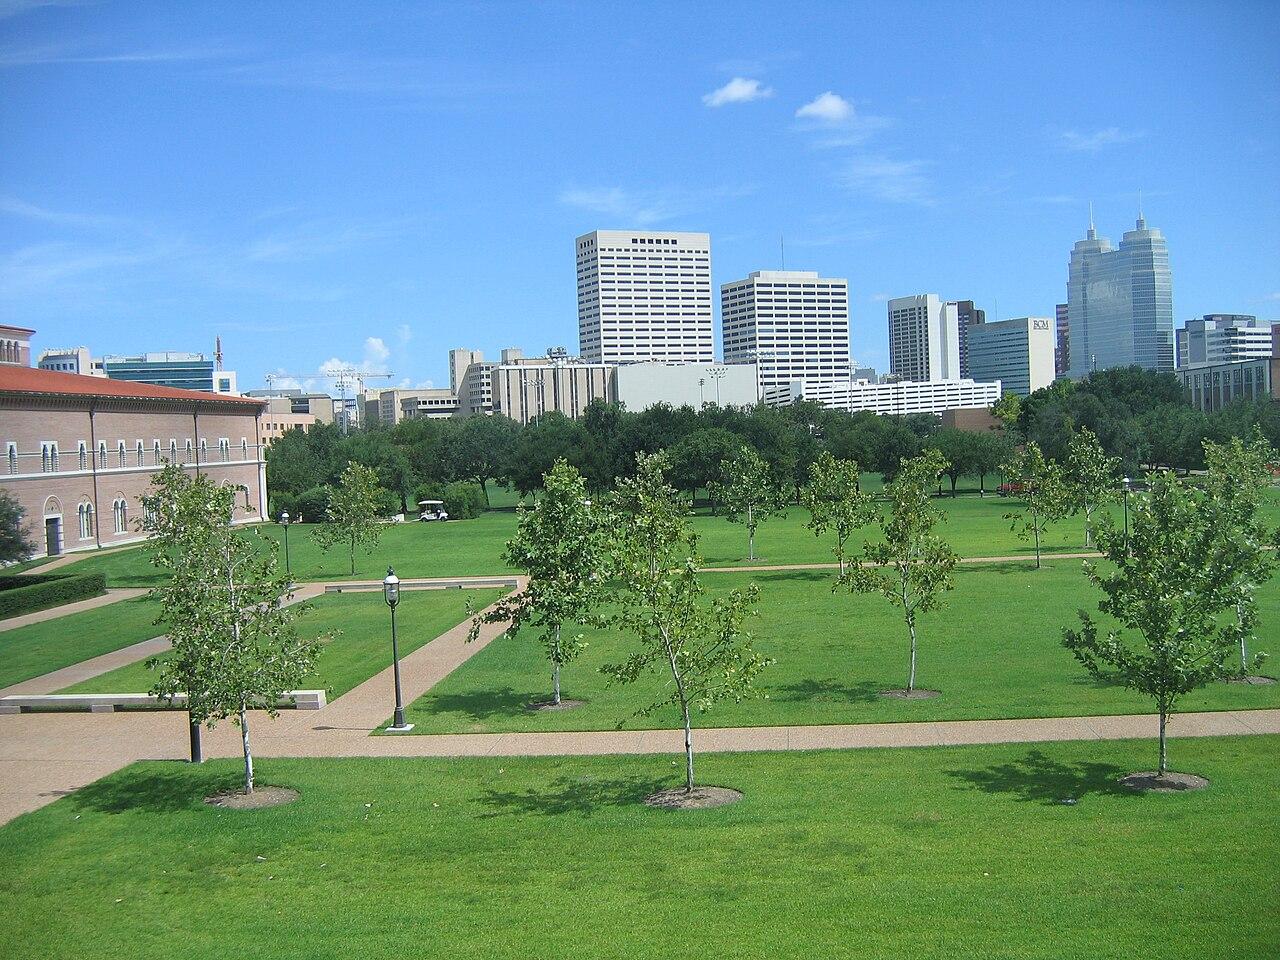 File:Texas Medical Center (Rice University View).jpeg